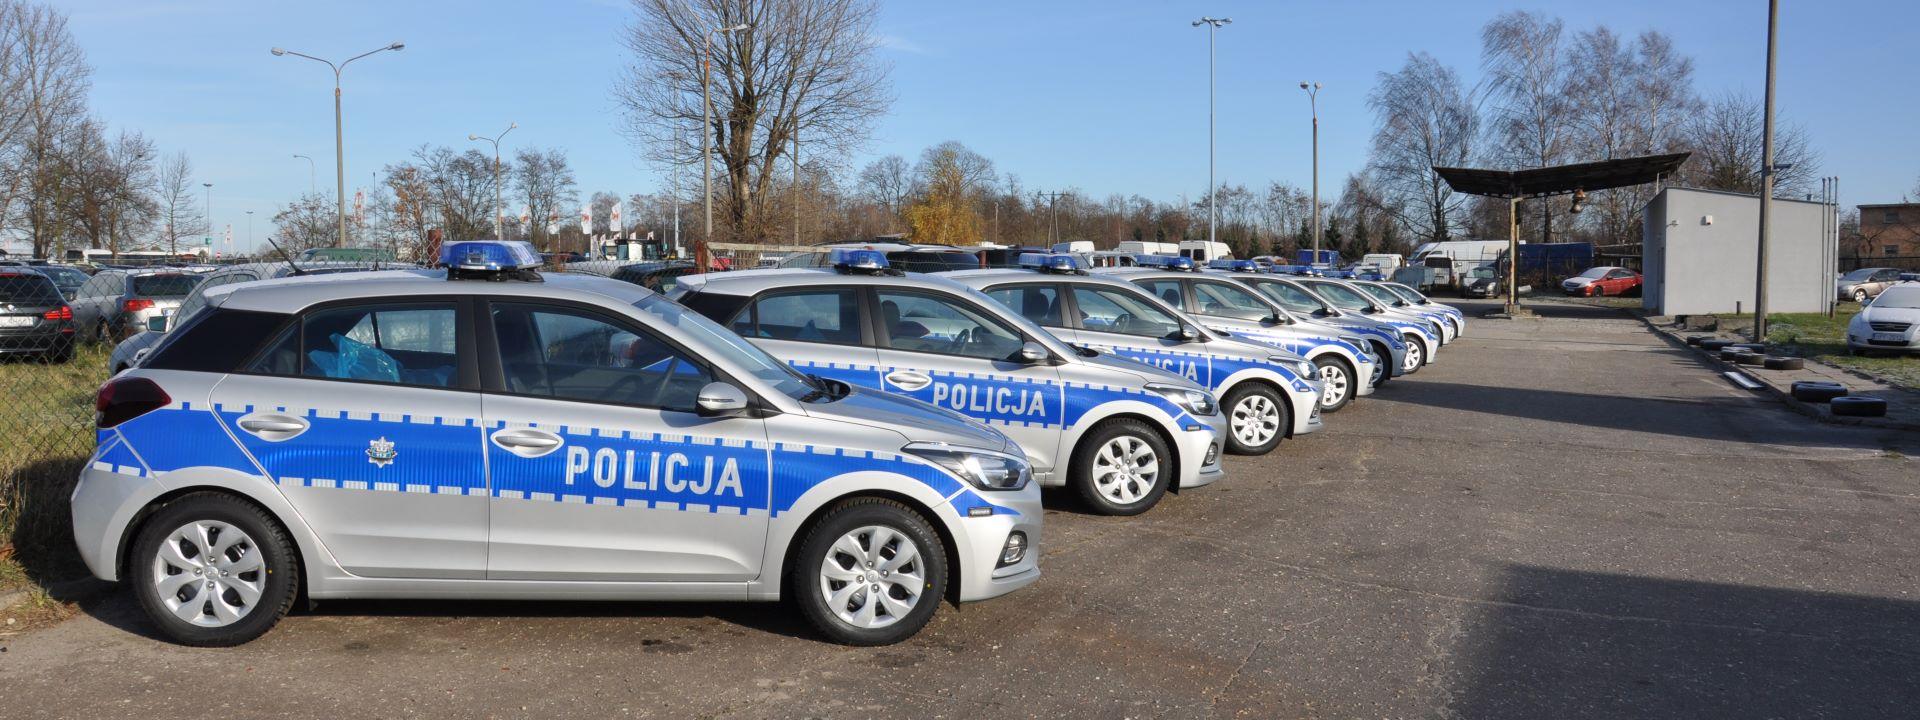 Policja w Hyundaiach